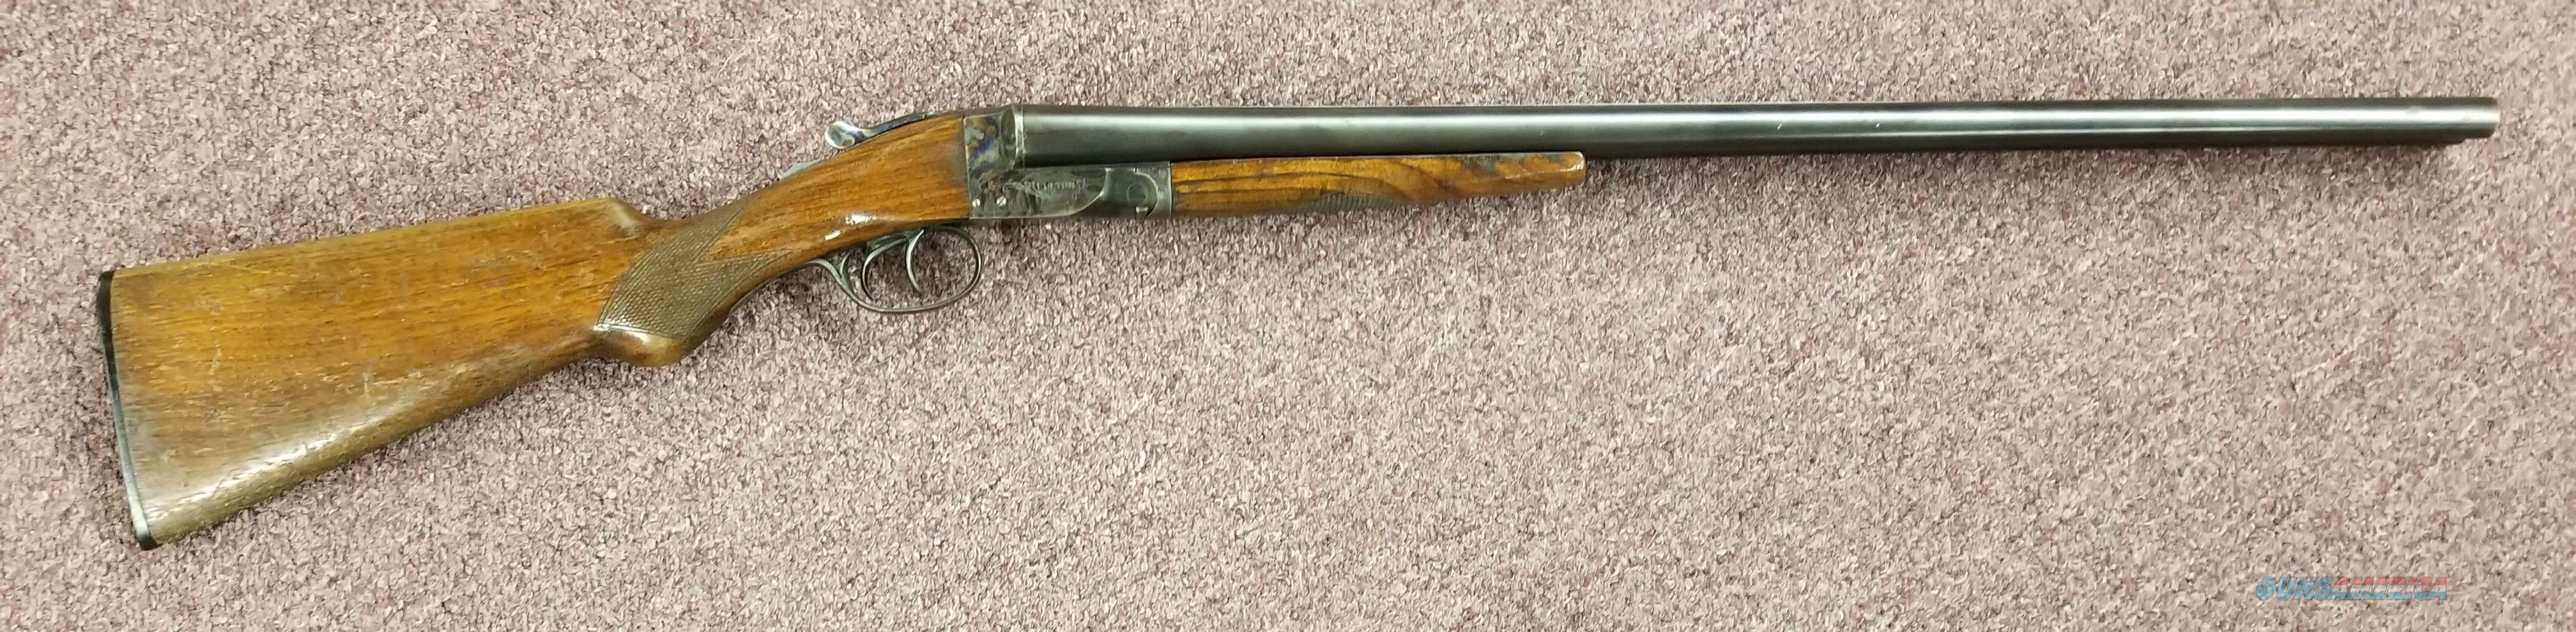 Hunter Arms - The Fulton - Double Barrel 12 Gauge - Free Shipping !  Guns > Shotguns > H Misc Shotguns